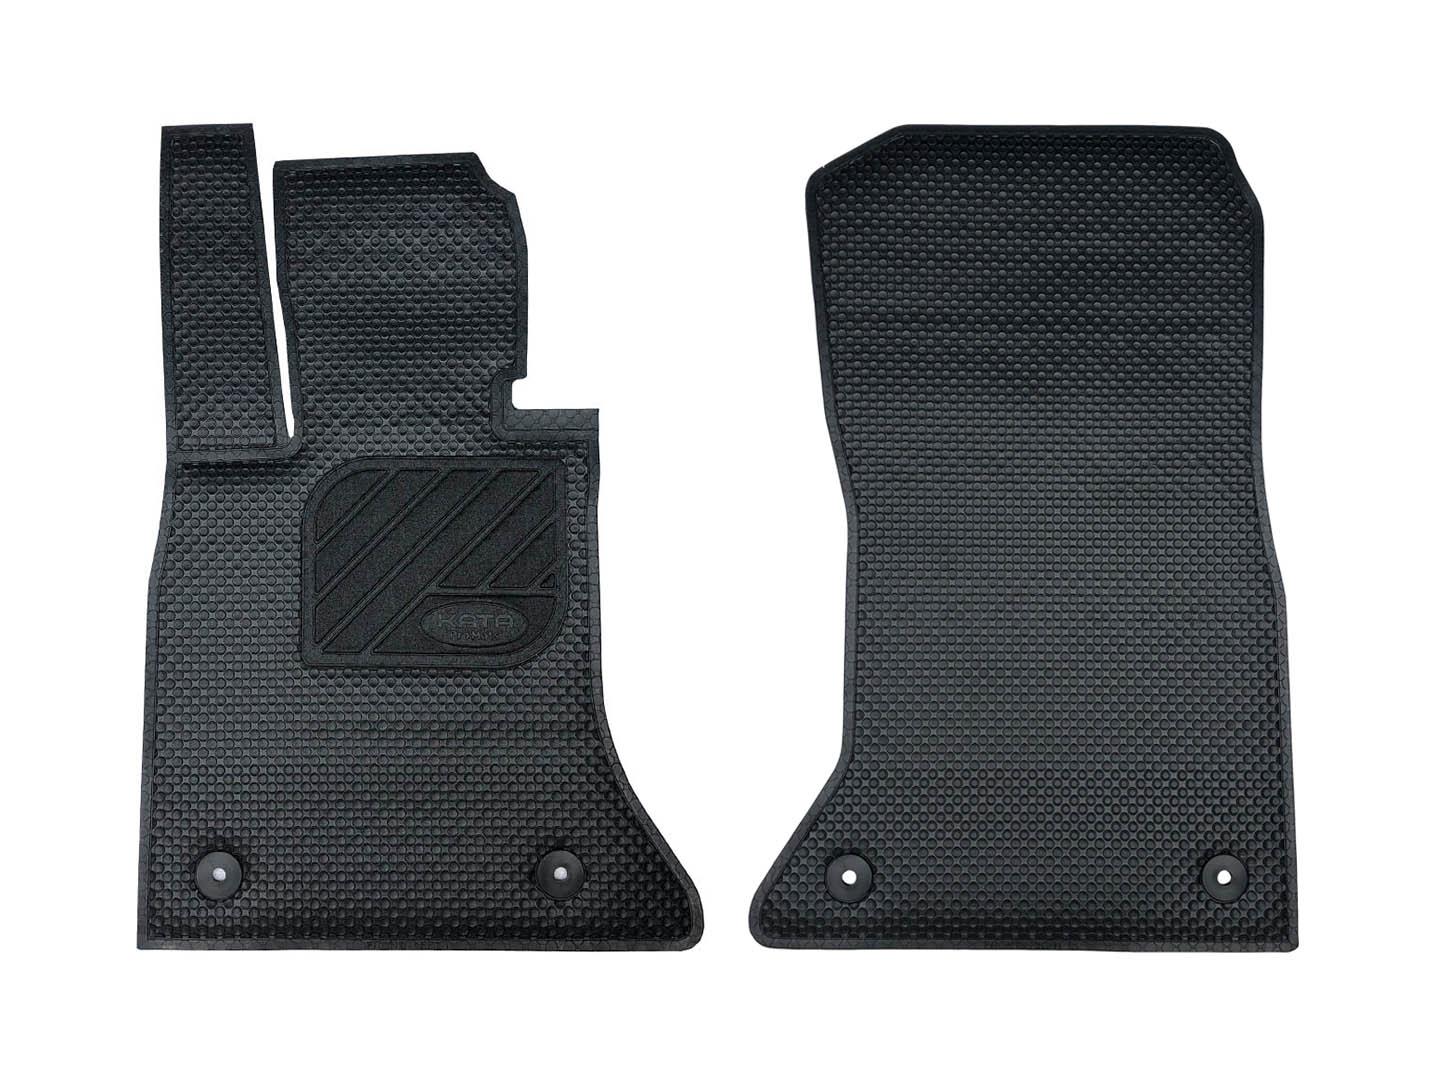 Thảm lót sàn Vinfast Lux A 2021 bản KATA Pro